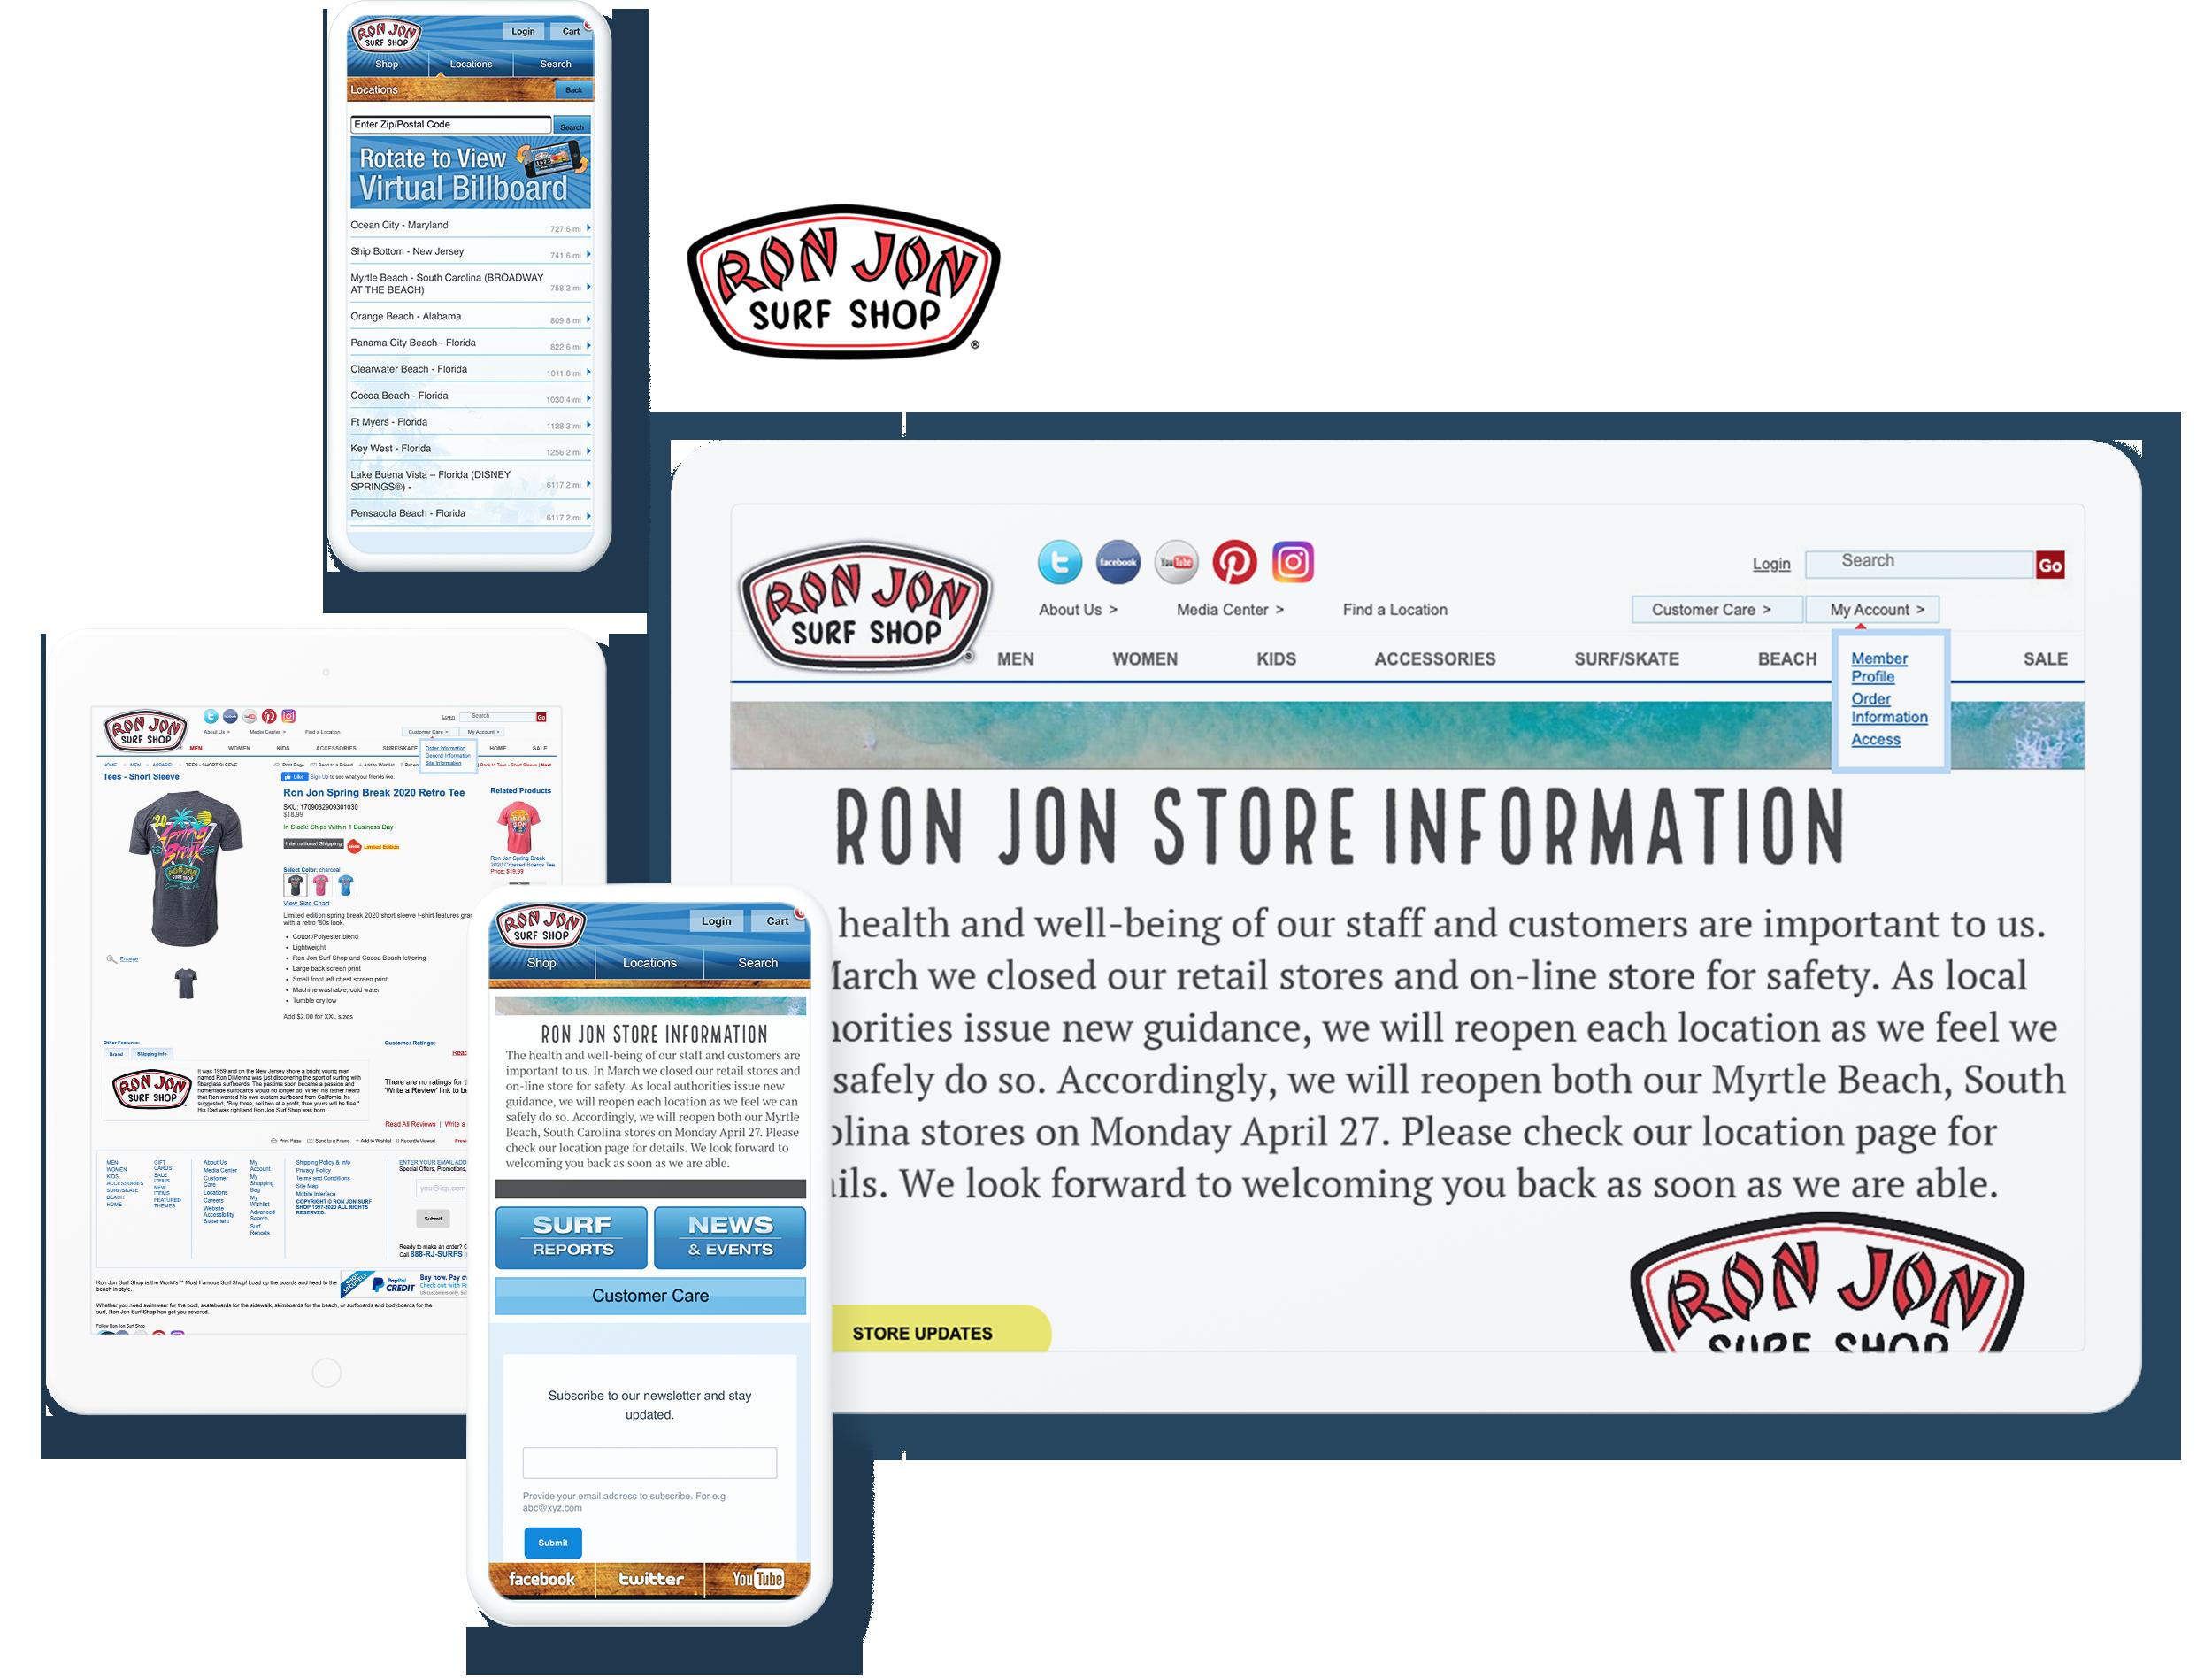 RON JON SURF SHOP SCREENS